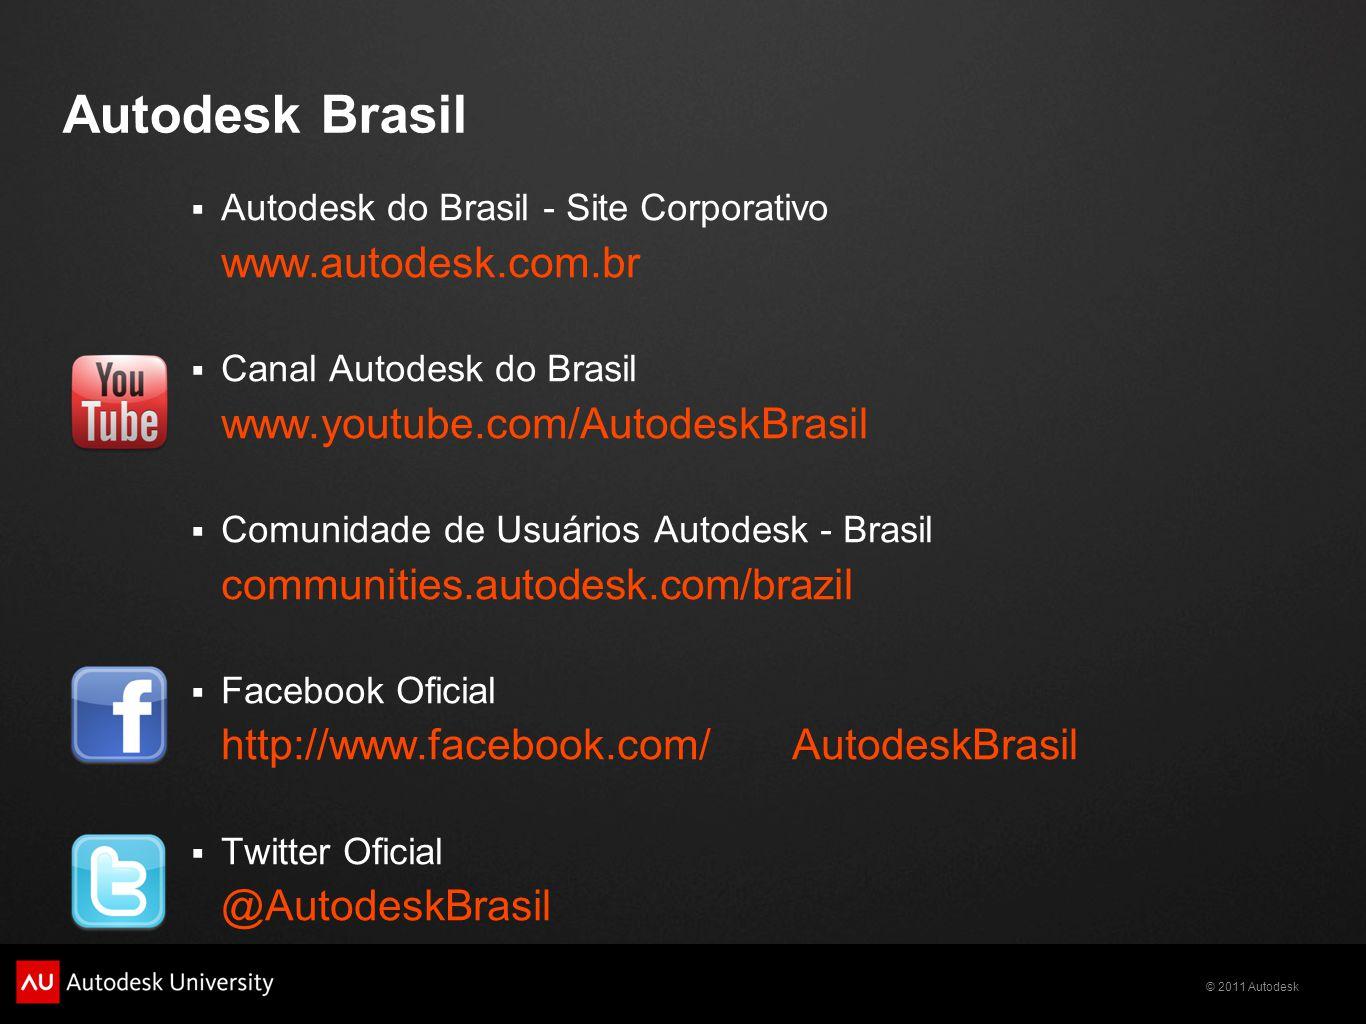 © 2011 Autodesk Autodesk Brasil  Autodesk do Brasil - Site Corporativo www.autodesk.com.br  Canal Autodesk do Brasil www.youtube.com/AutodeskBrasil  Comunidade de Usuários Autodesk - Brasil communities.autodesk.com/brazil  Facebook Oficial http://www.facebook.com/ AutodeskBrasil  Twitter Oficial @AutodeskBrasil